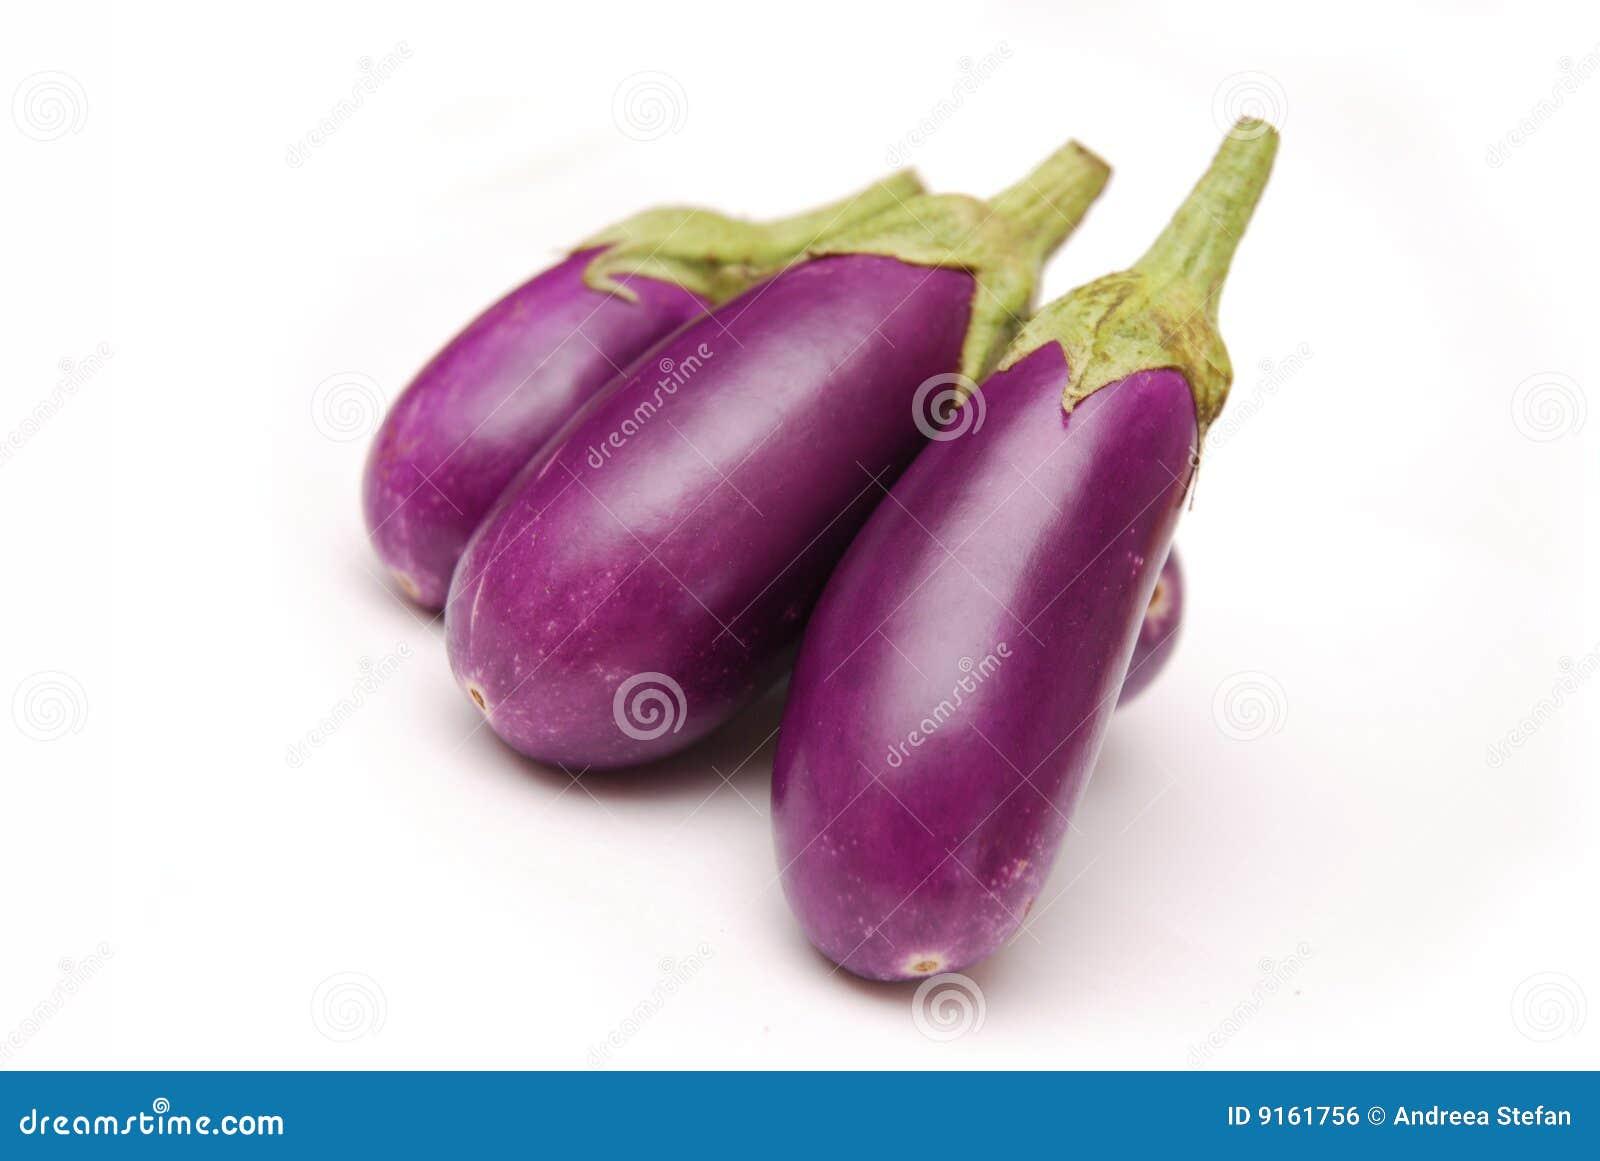 purple babies